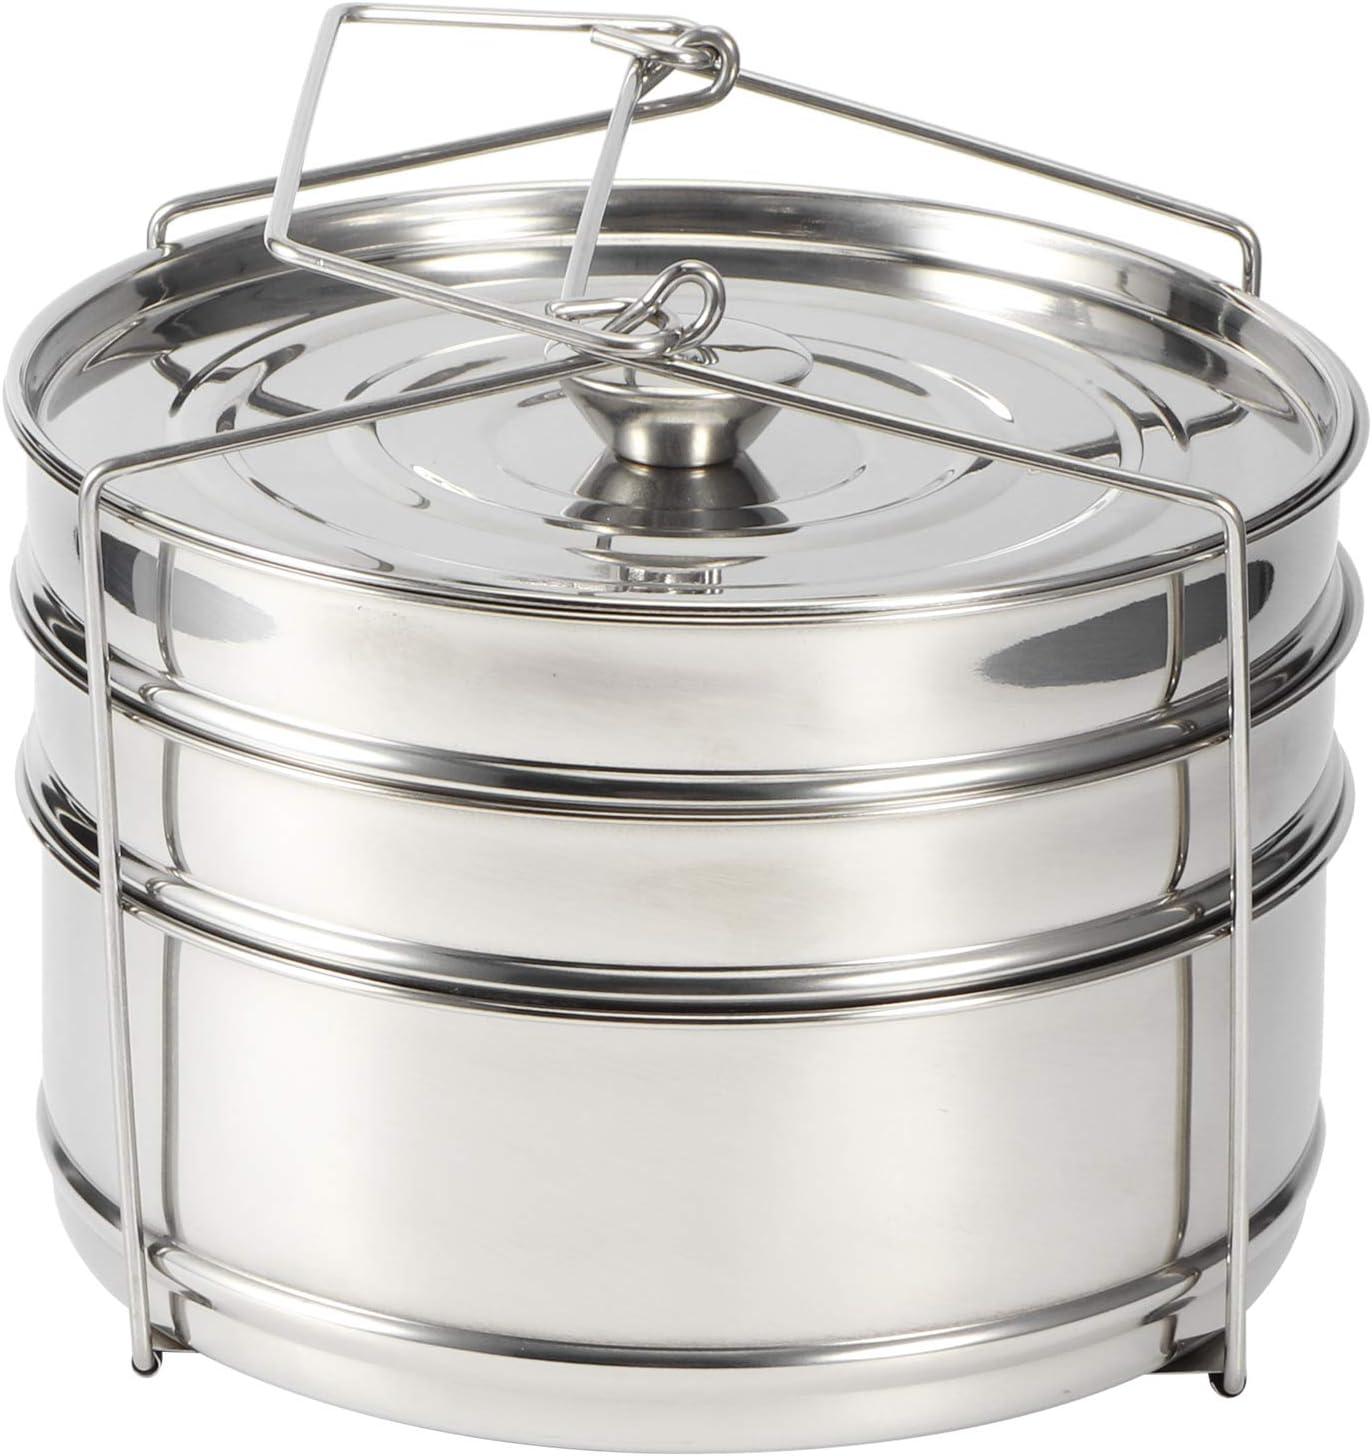 Ladieshow Stackable 3 Tier Stainless Steel Steamer Cooker Pot Set Cook Food Pressure Pot Accessories for Pressure Cooker, Upgrade Interchangeable Lids